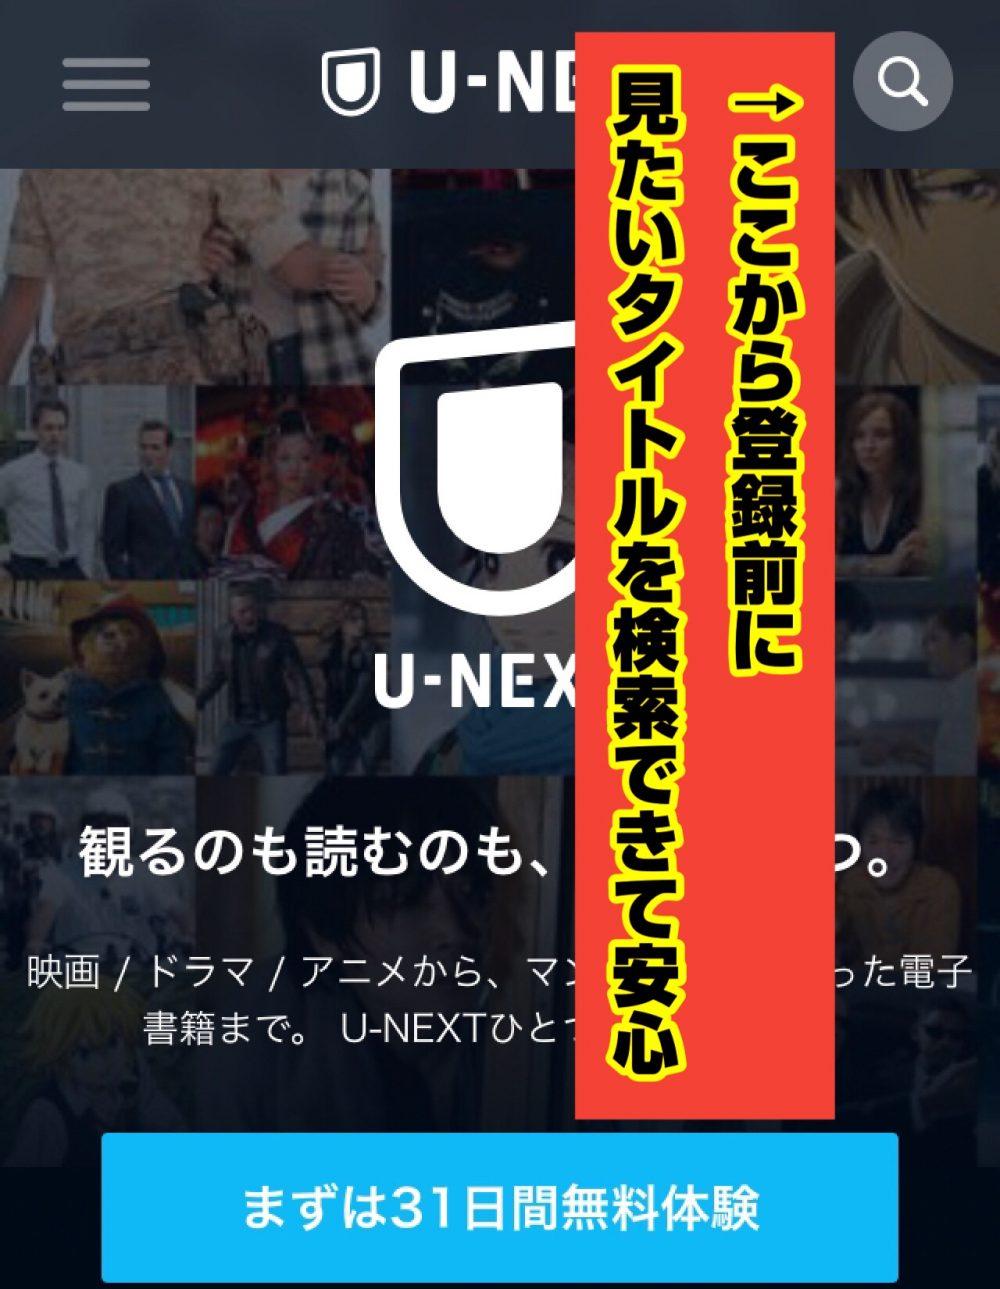 U-NEXTはみたい動画があるか、事前に調べてから無料体験できて安心